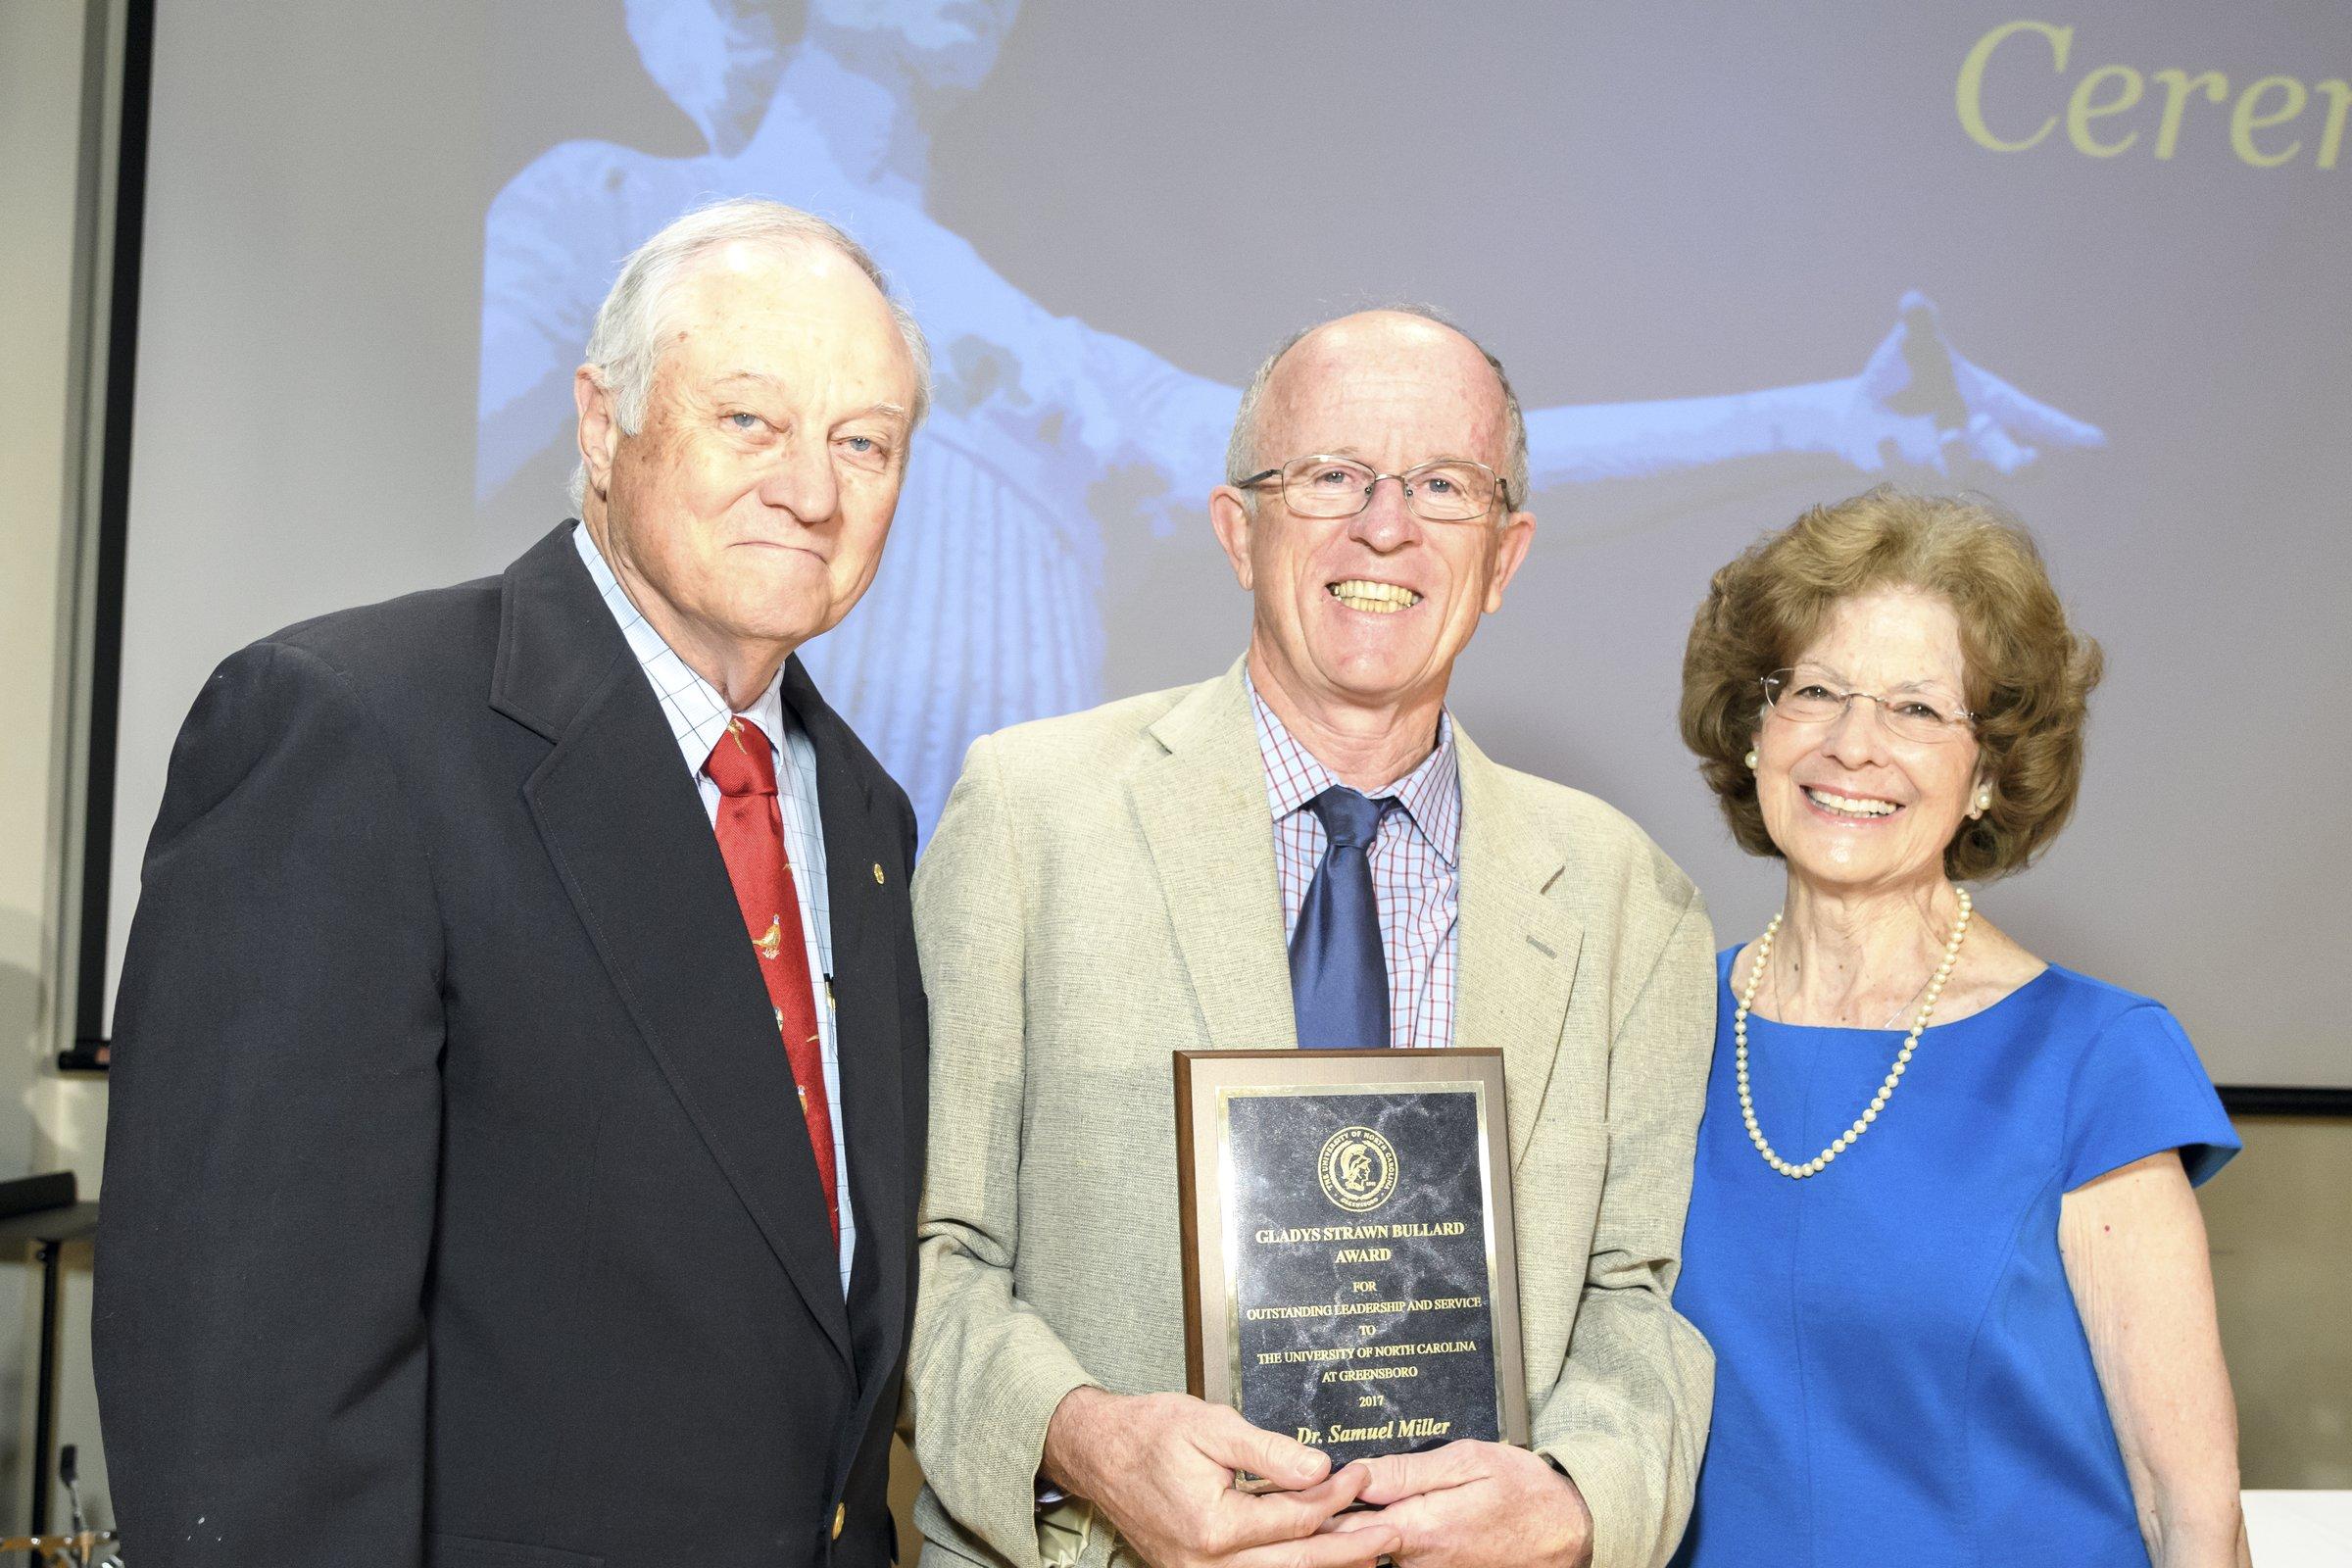 Photo of male award recipient